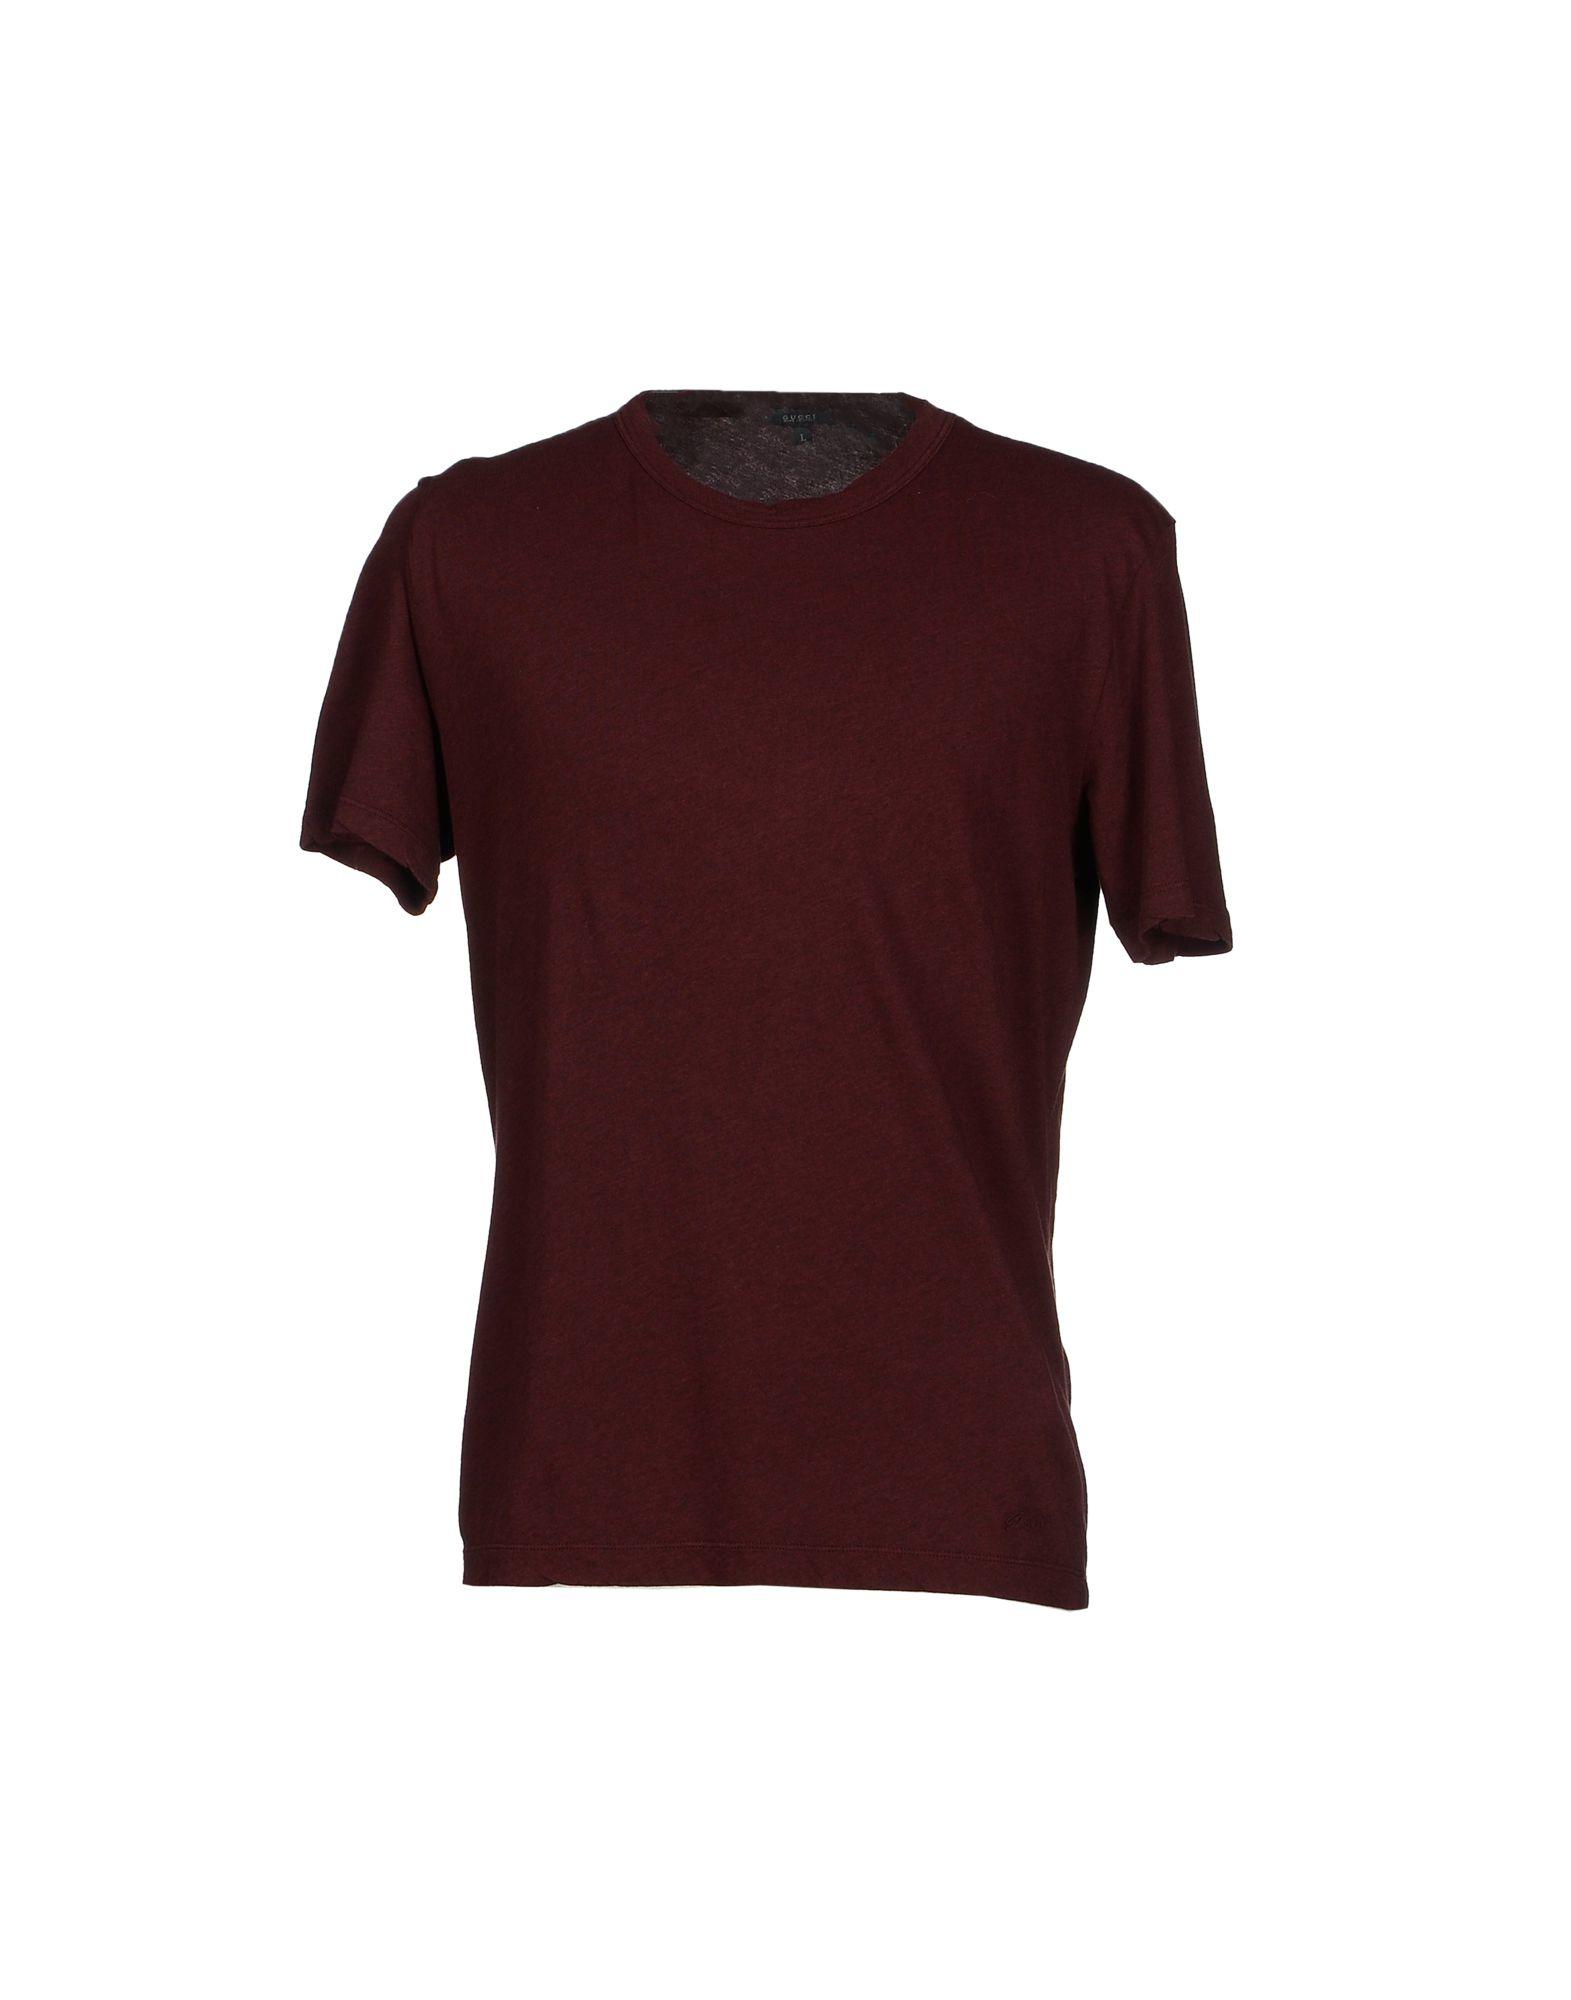 lyst gucci t shirt in purple for men. Black Bedroom Furniture Sets. Home Design Ideas